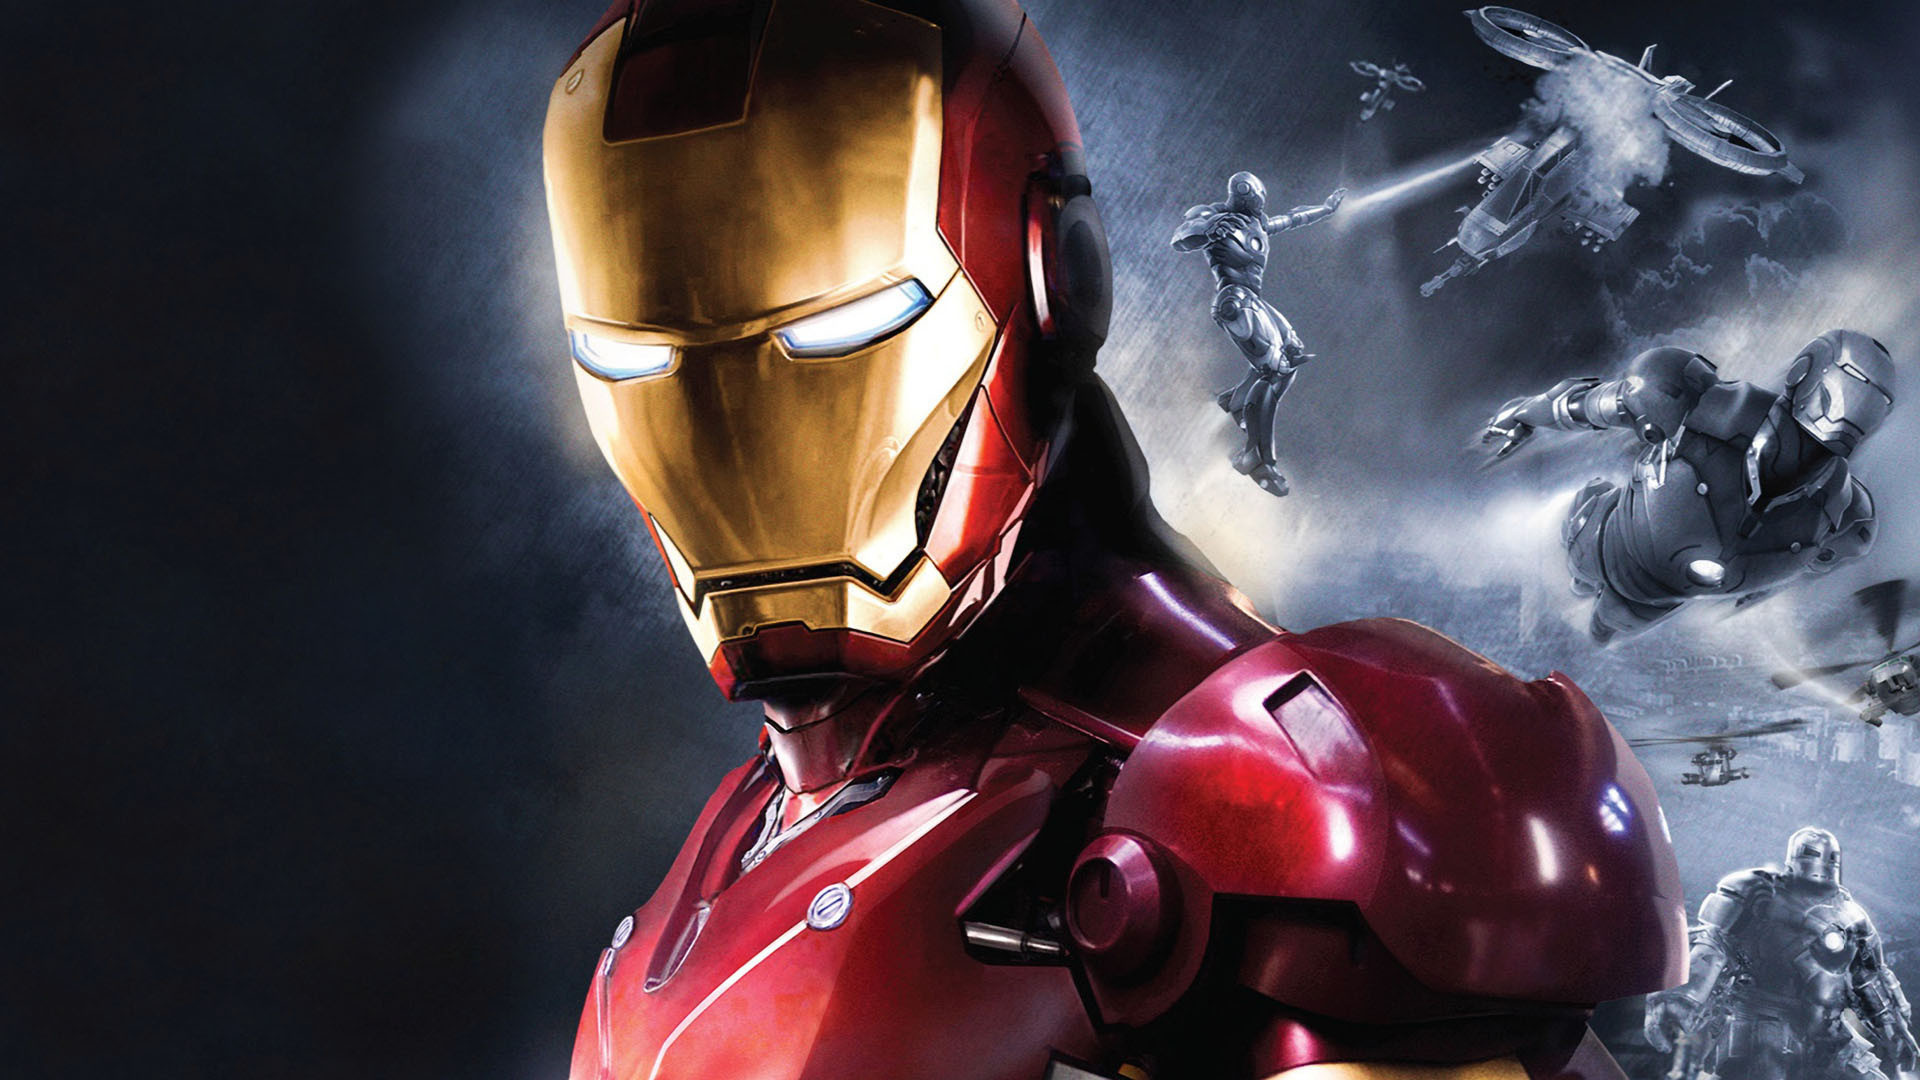 Iron man full hd fond d 39 cran and arri re plan 1920x1080 id 373526 - Iron man telecharger ...